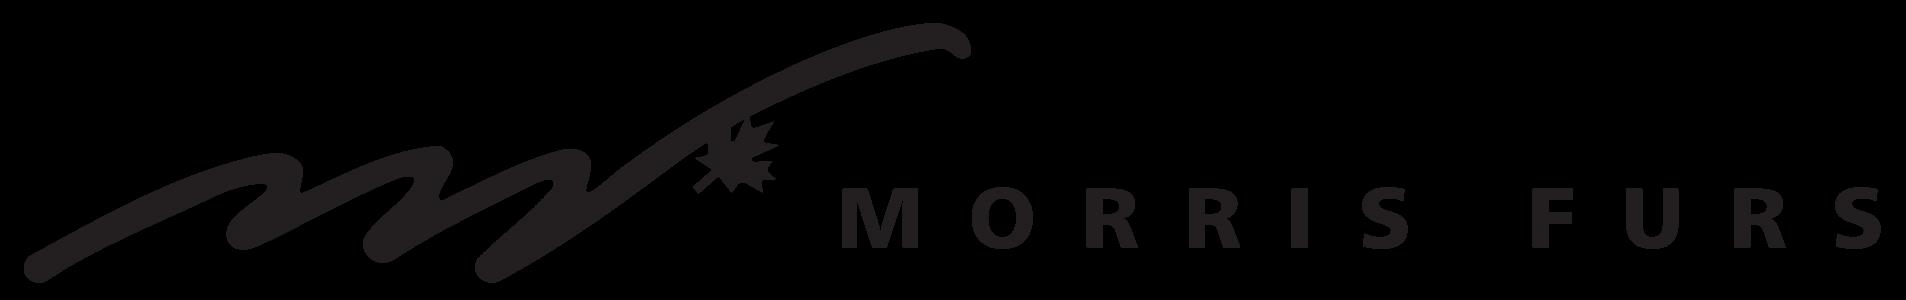 Morris Furs logo